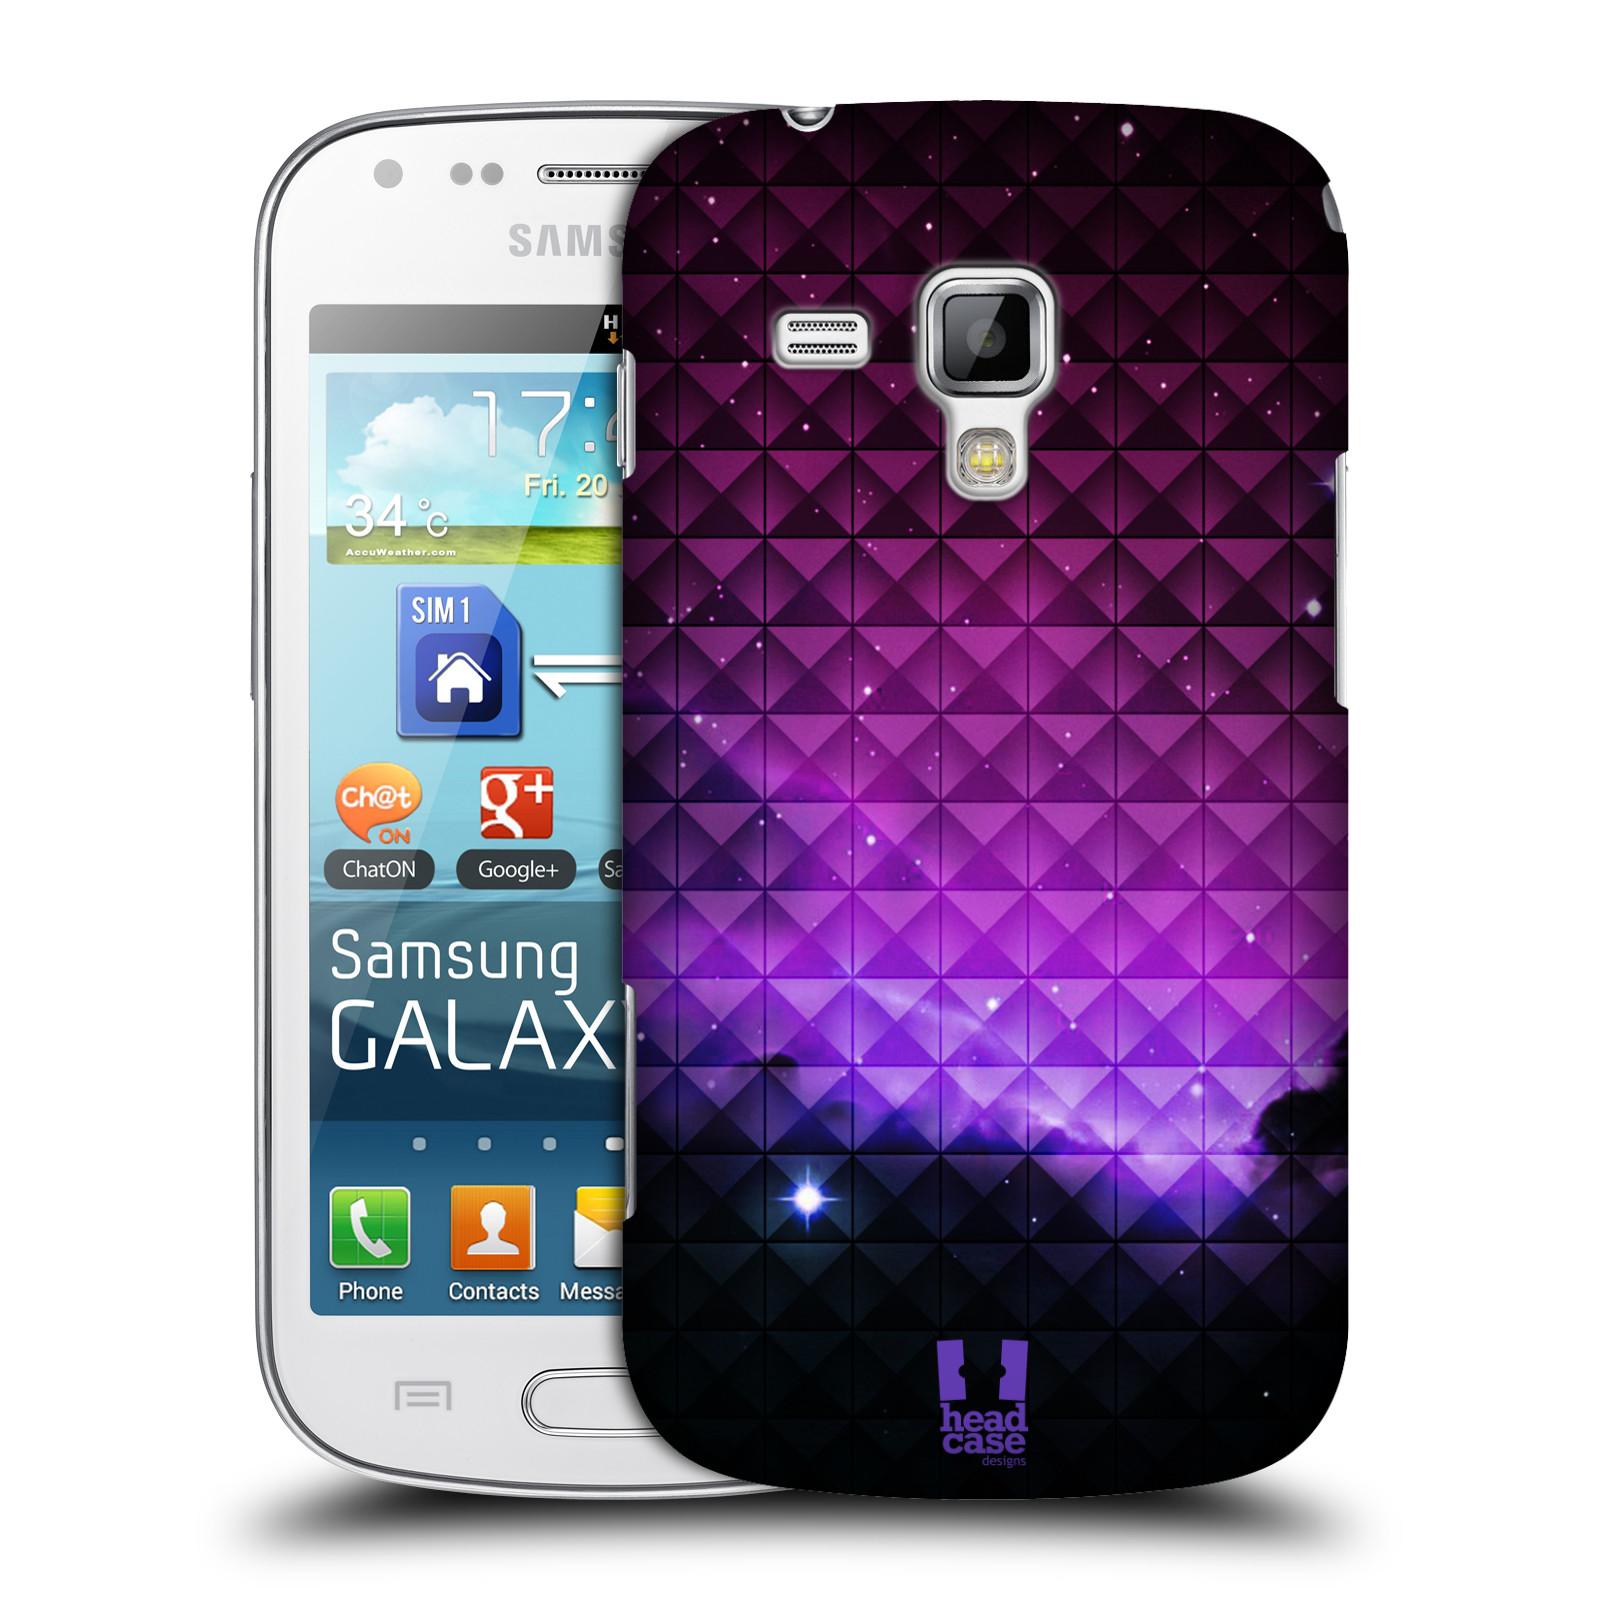 Plastové pouzdro na mobil Samsung Galaxy S Duos HEAD CASE PURPLE HAZE (Kryt či obal na mobilní telefon Samsung Galaxy S Duos GT-S7562)